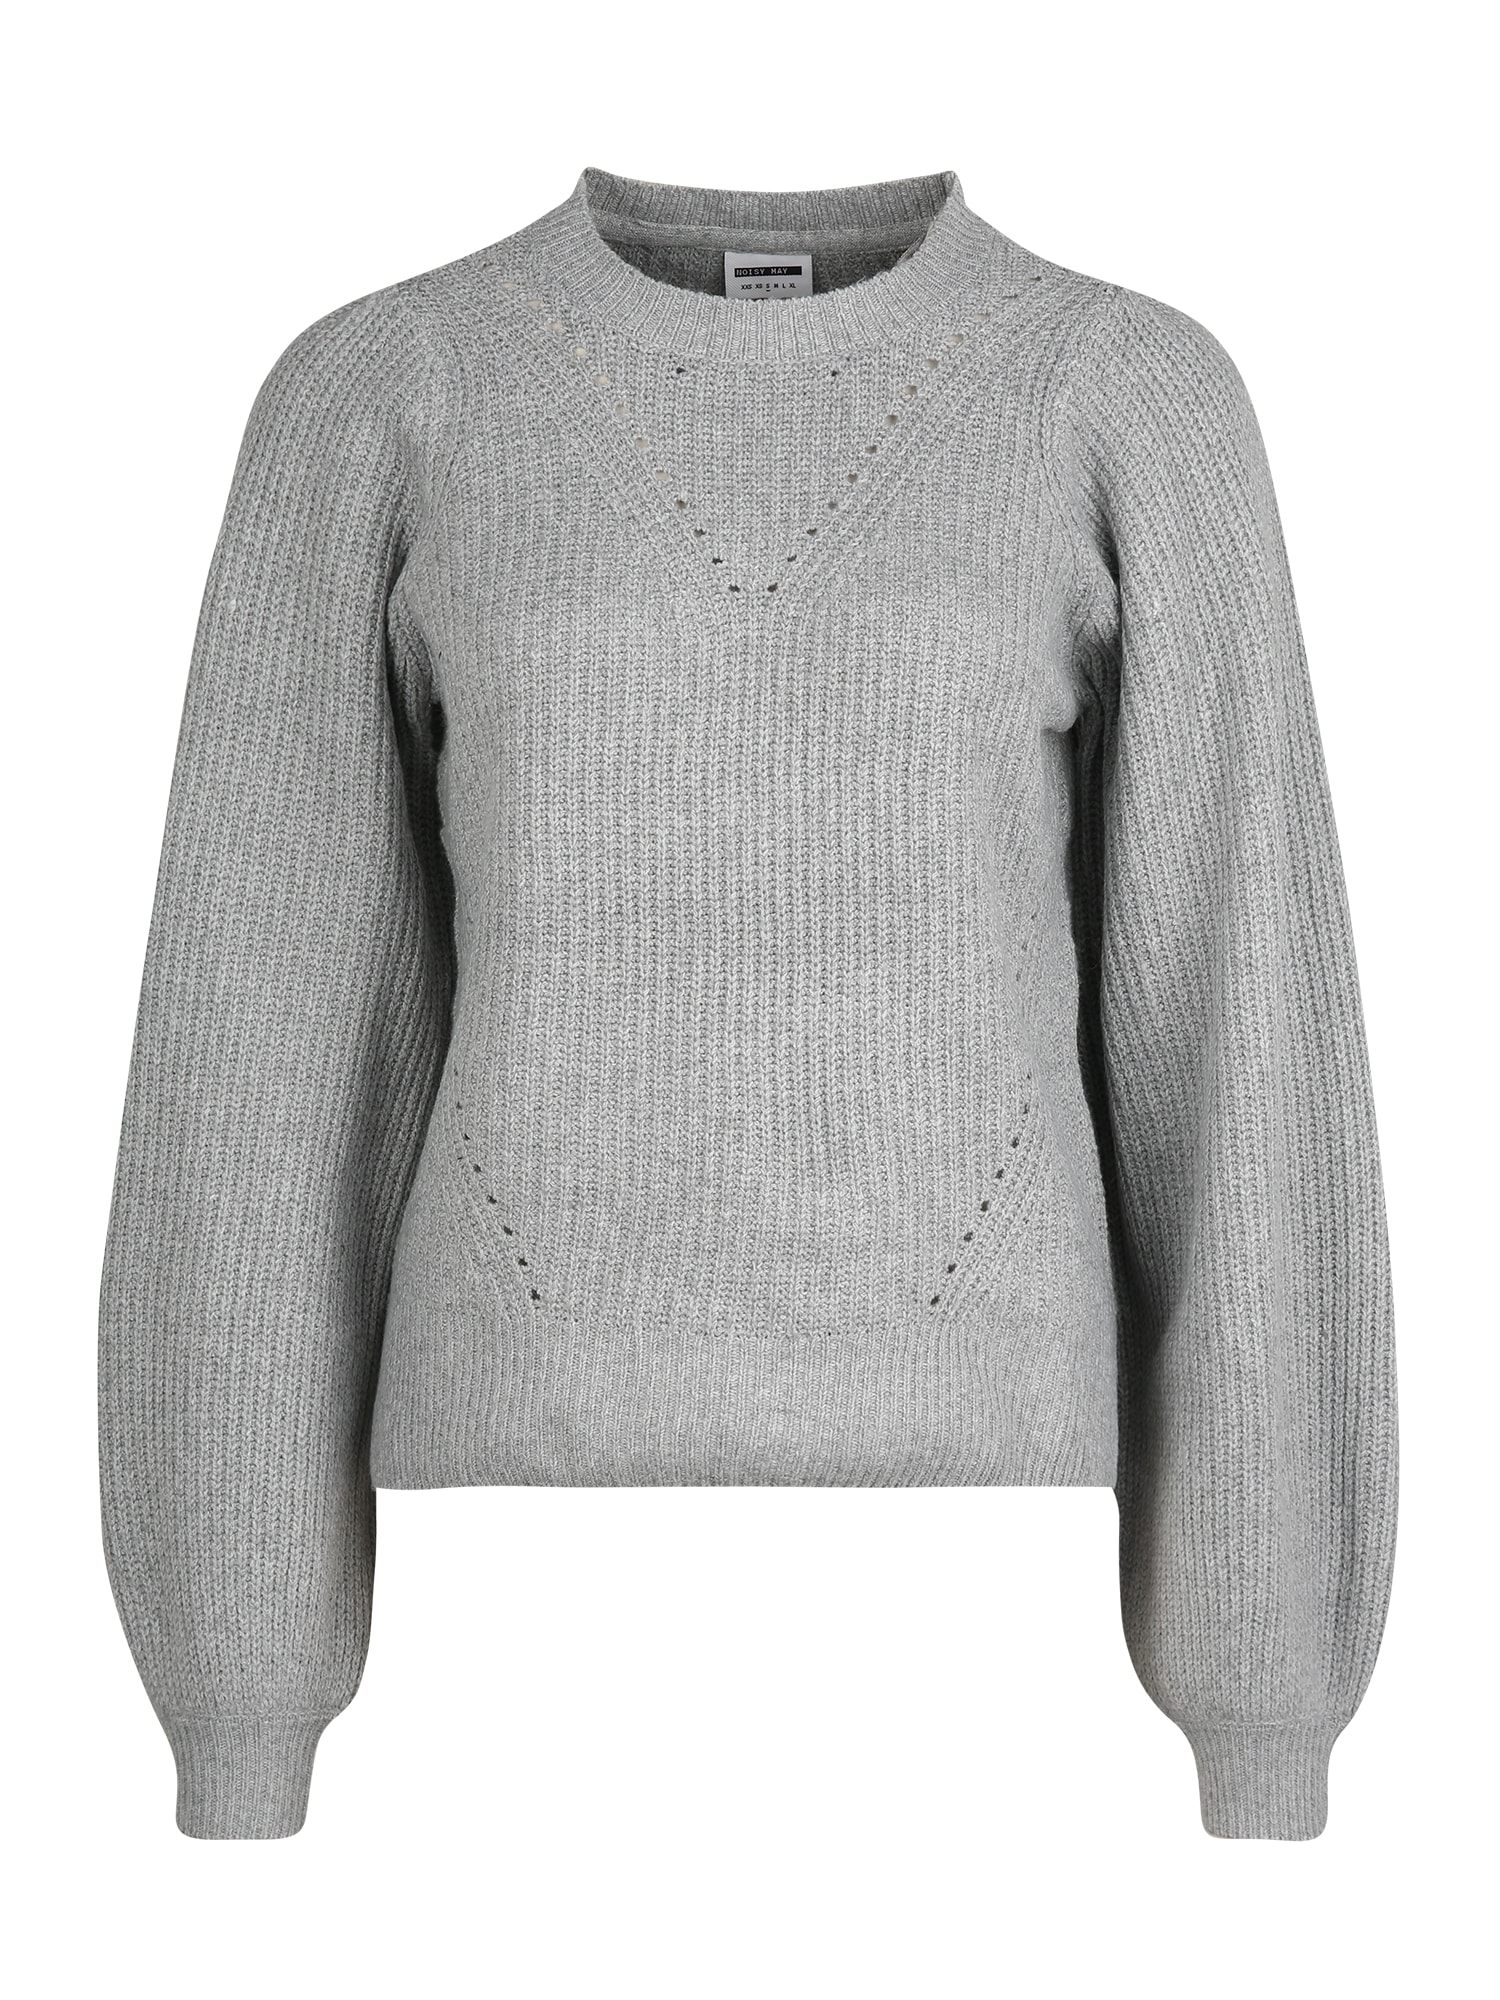 Noisy May (Tall) Megztinis šviesiai pilka / pilka